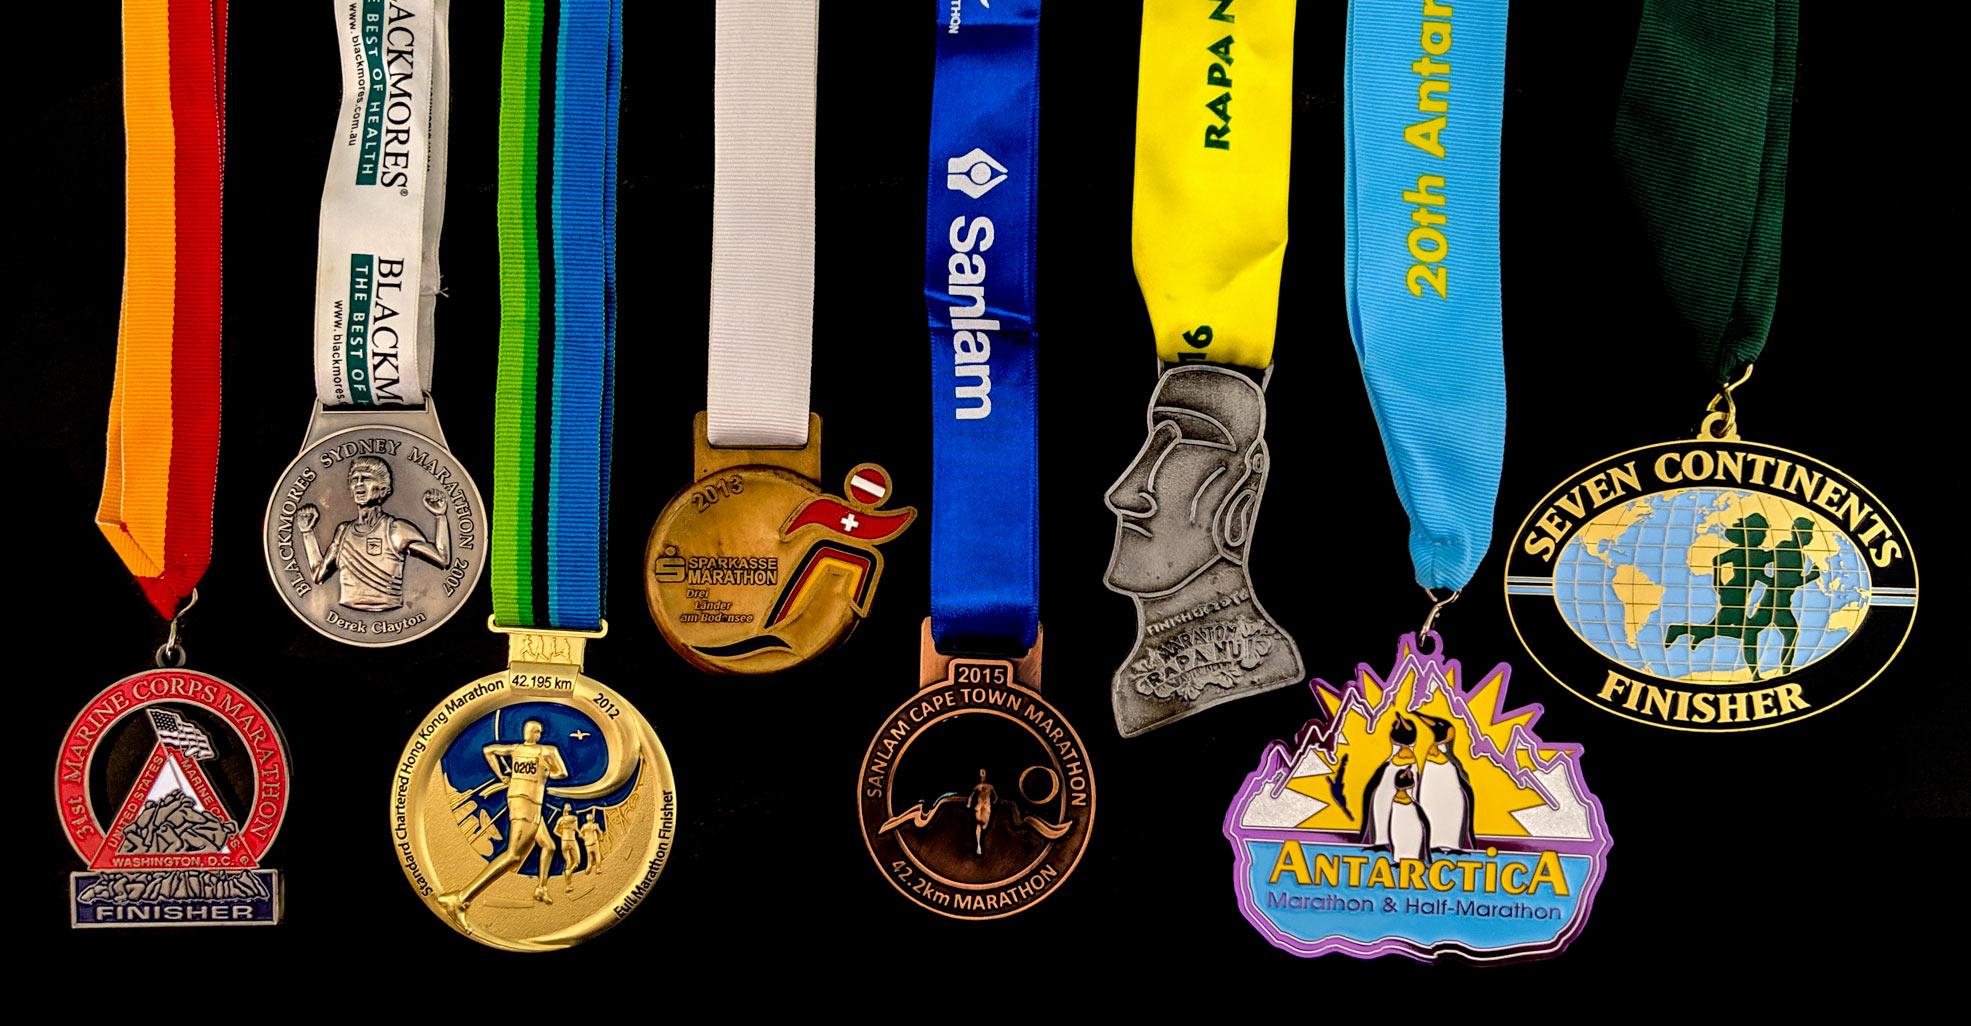 Halef's seven continents medals (from left to right): 2006 Marine Corps Marathon (North America), 2007 Blackmores Sydney Marathon (Australia), 2012 Standard Chartered Hong Kong Marathon (Asia), 2013 Sparkasse Bodensee Marathon (Europe), 2015 Sanlam Cape Town Marathon (Africa), 2016 Rapa Nui Marathon (South America), 2019 Antarctica Marathon (Antarctica)